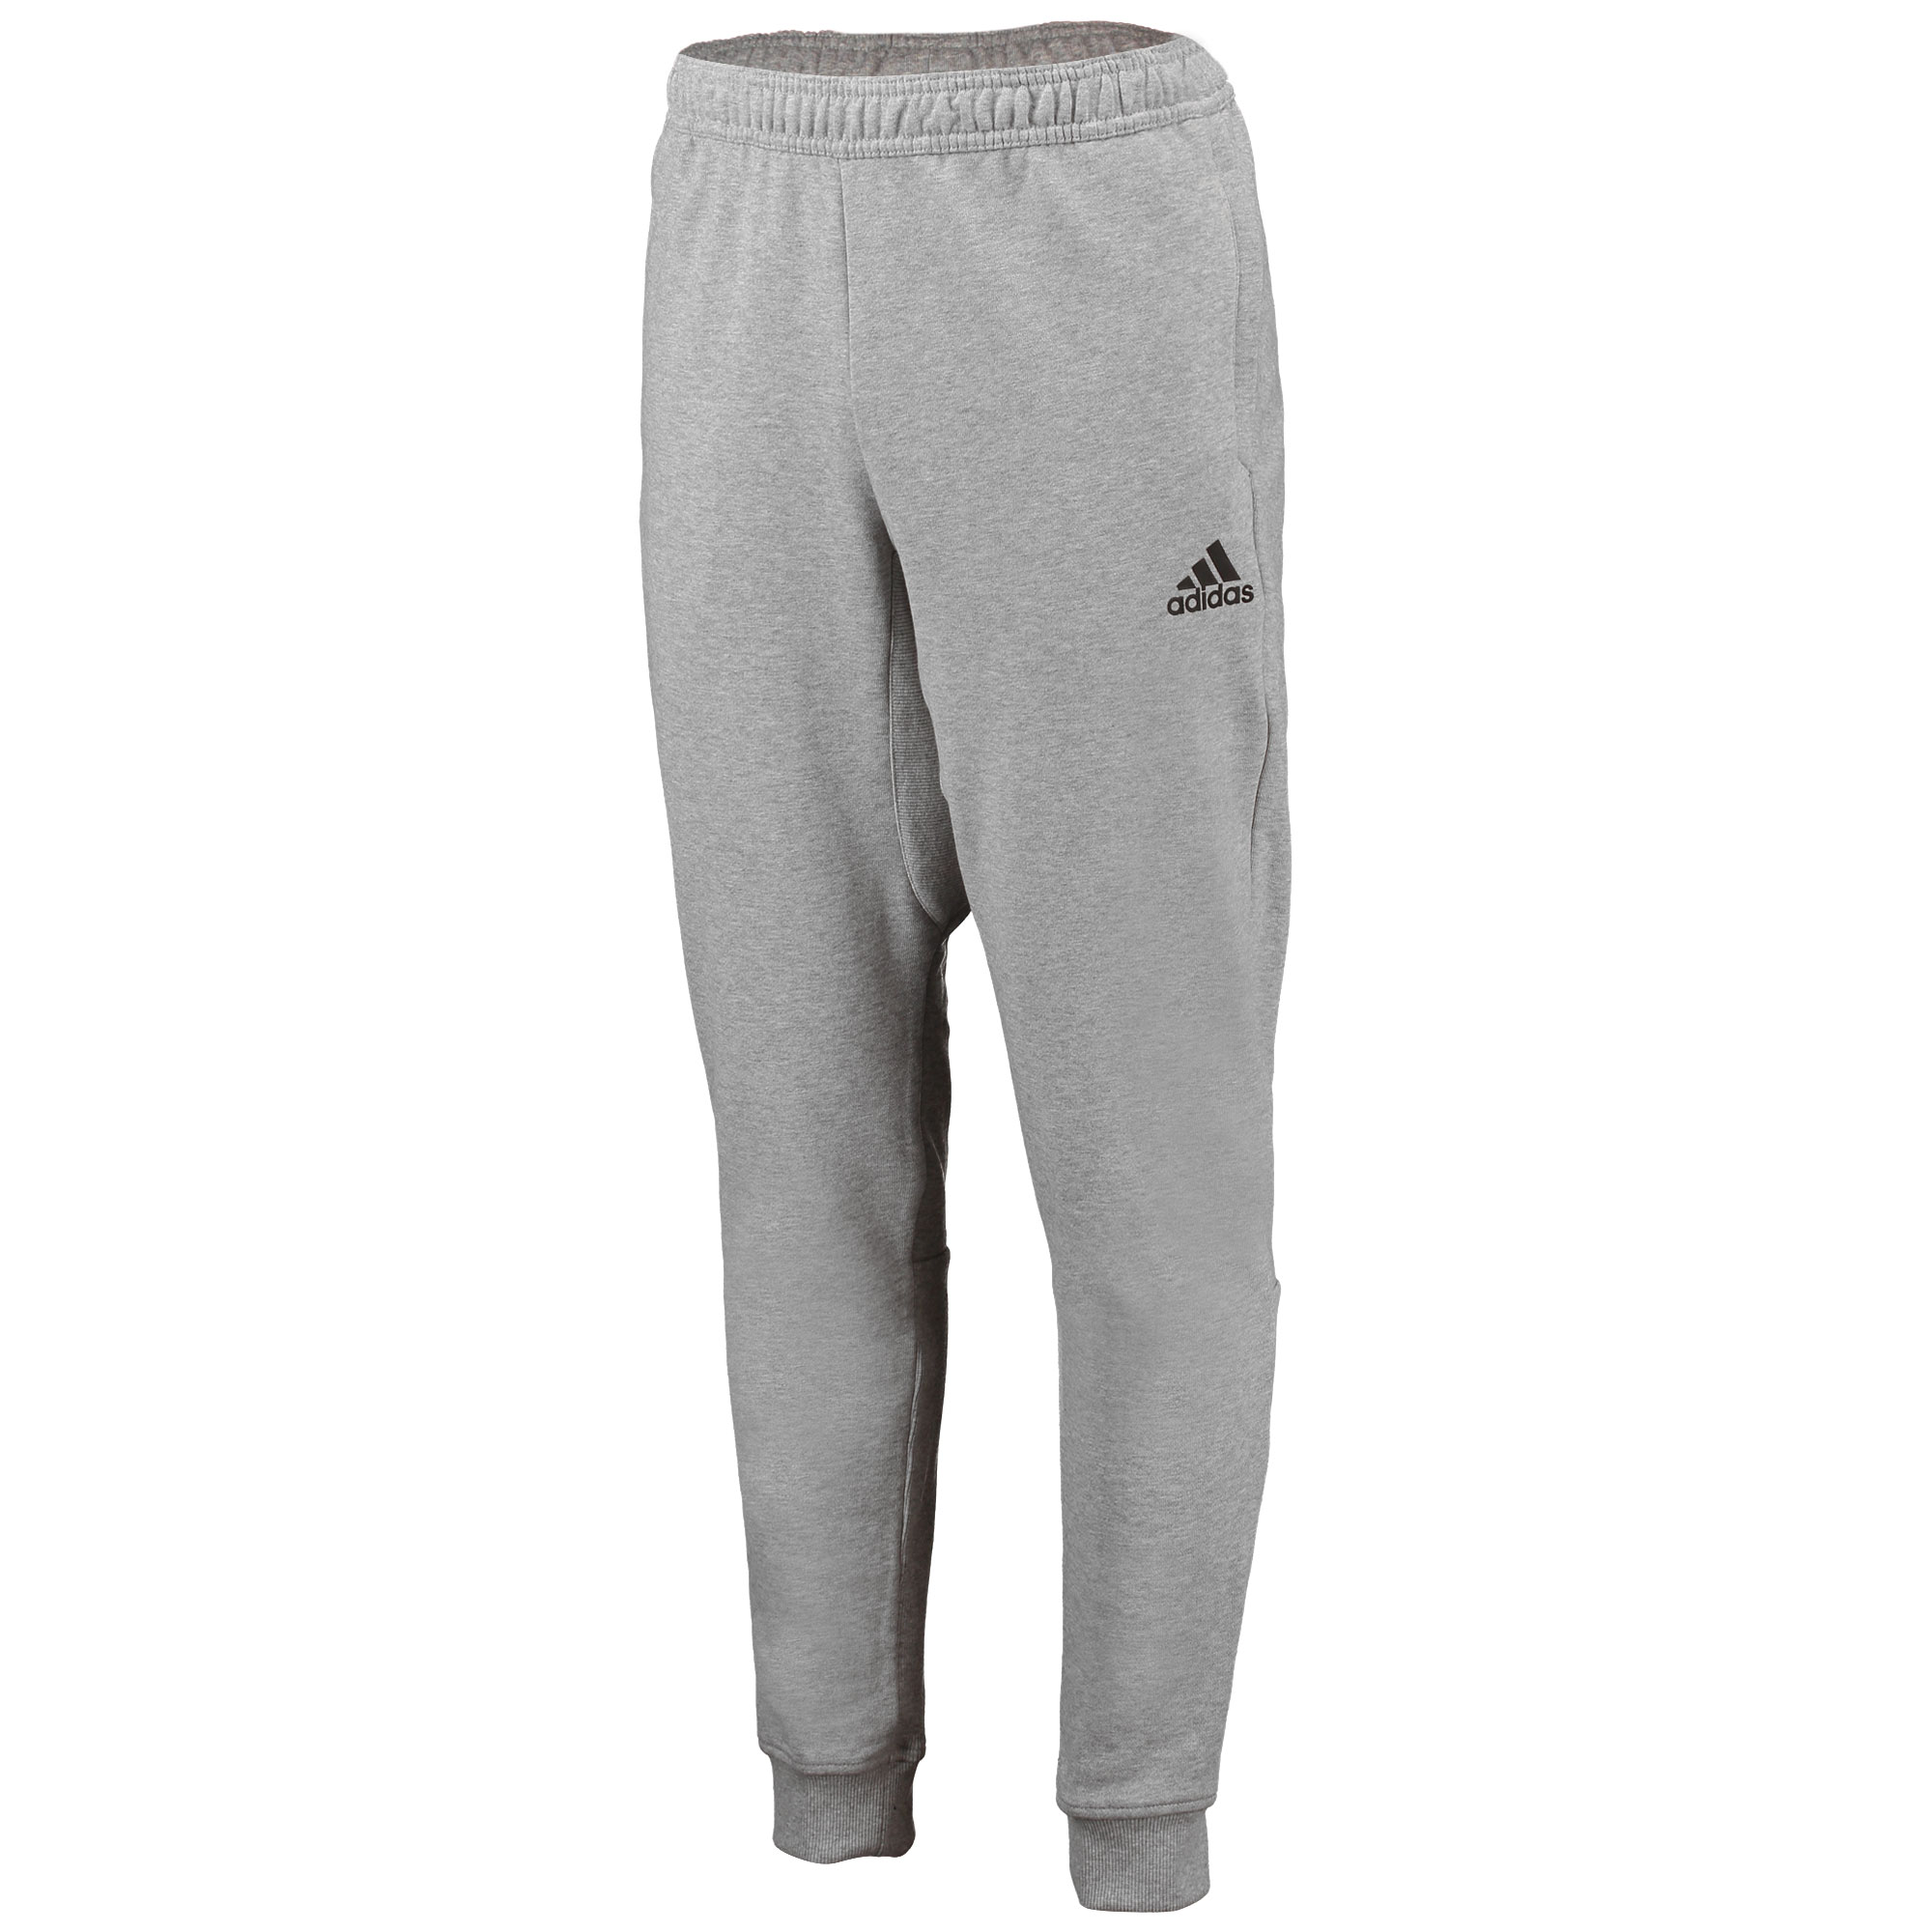 Adidas Tango Sweatpants - Grey